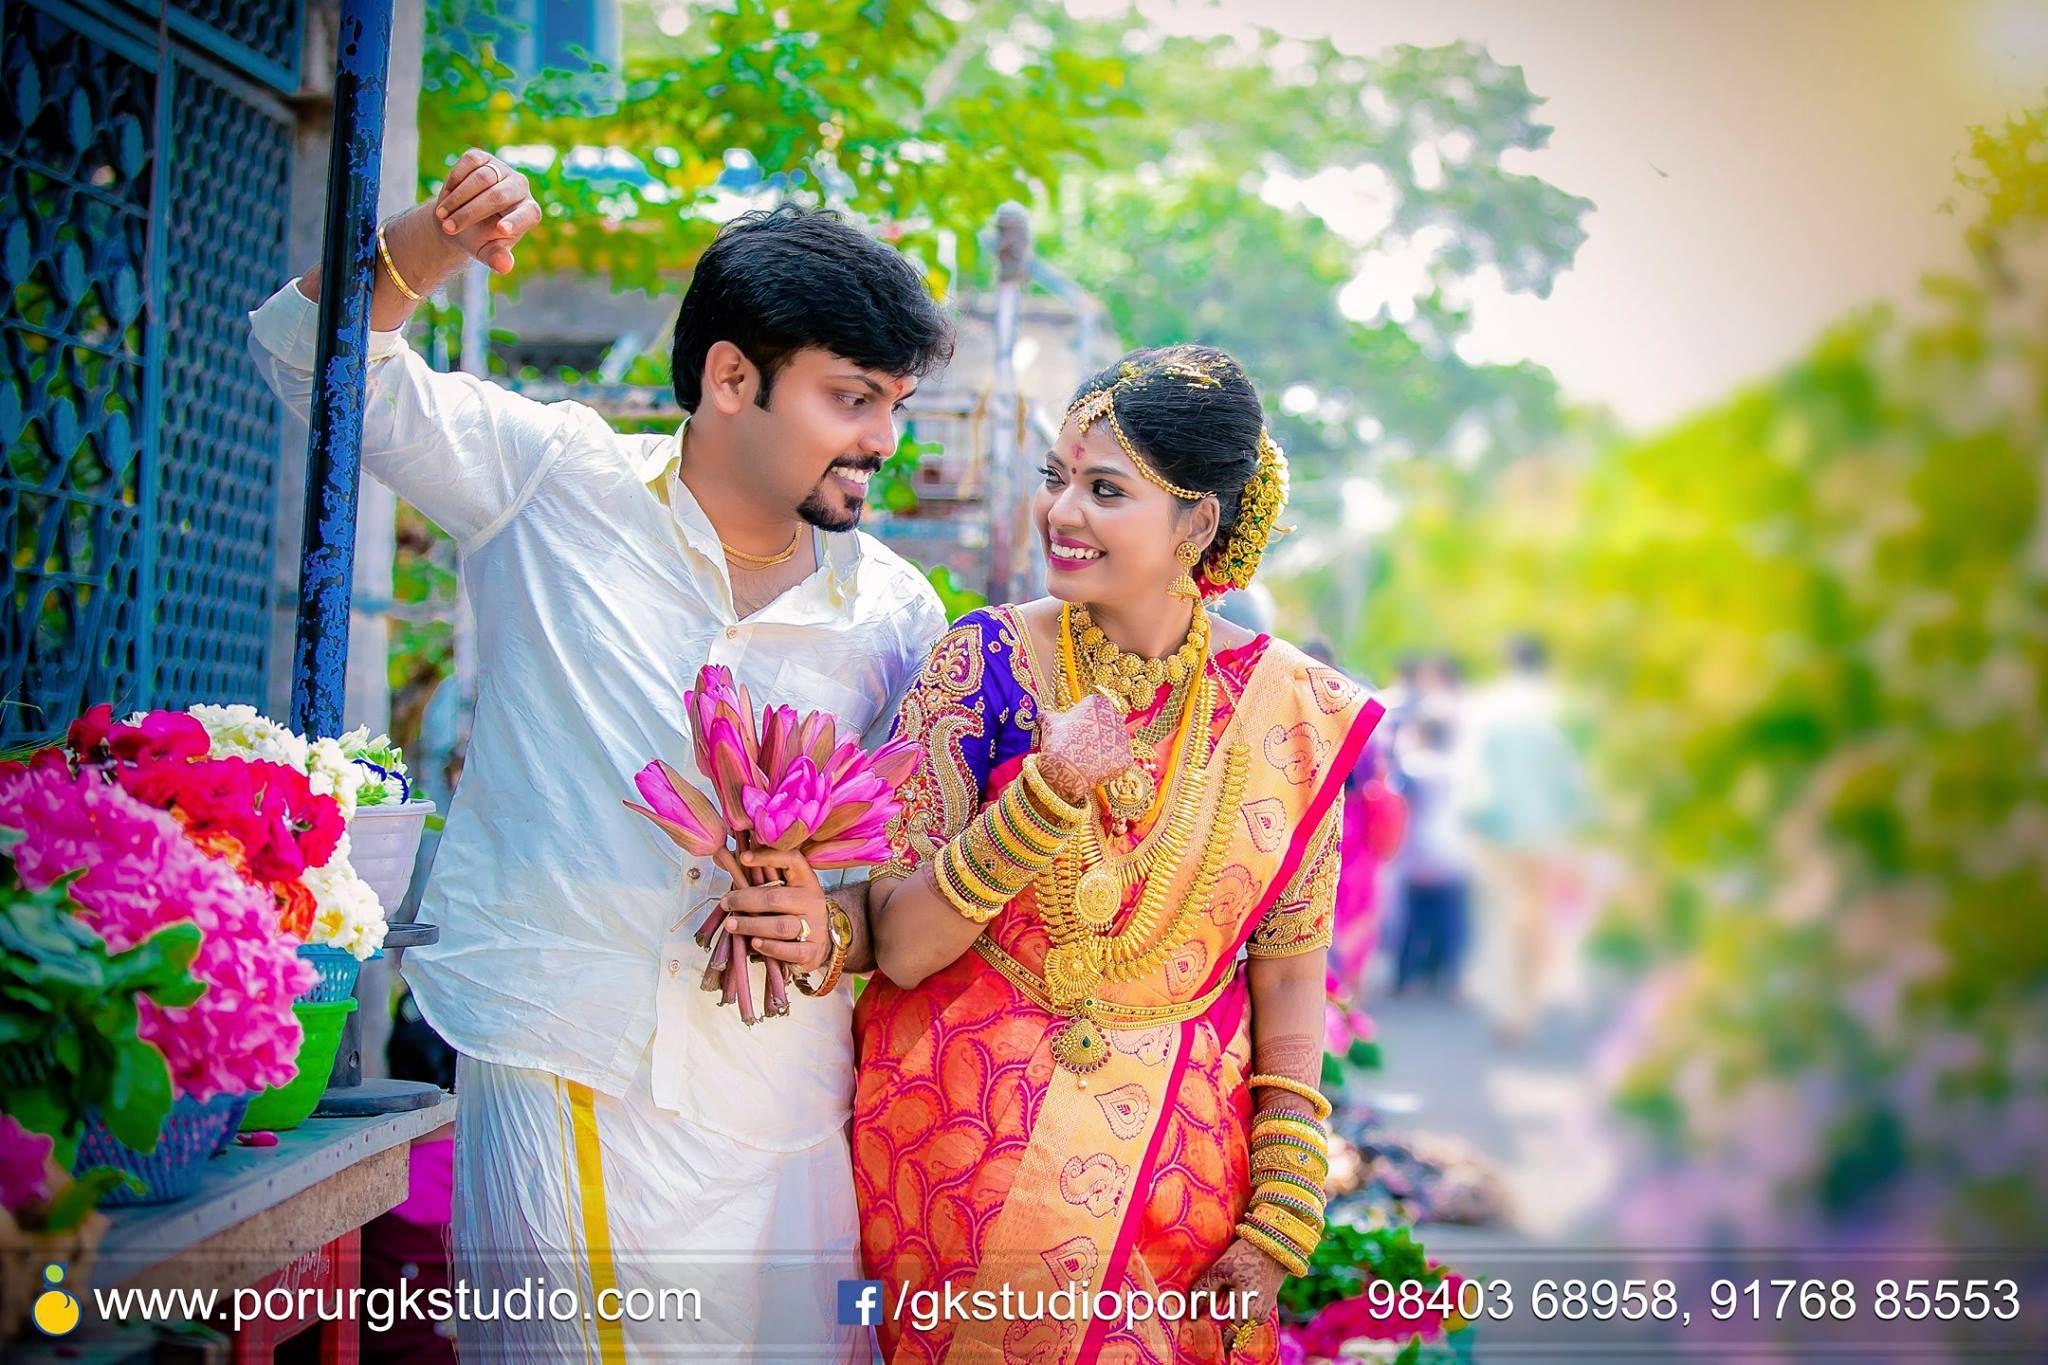 High quality professional wedding photos in chennai